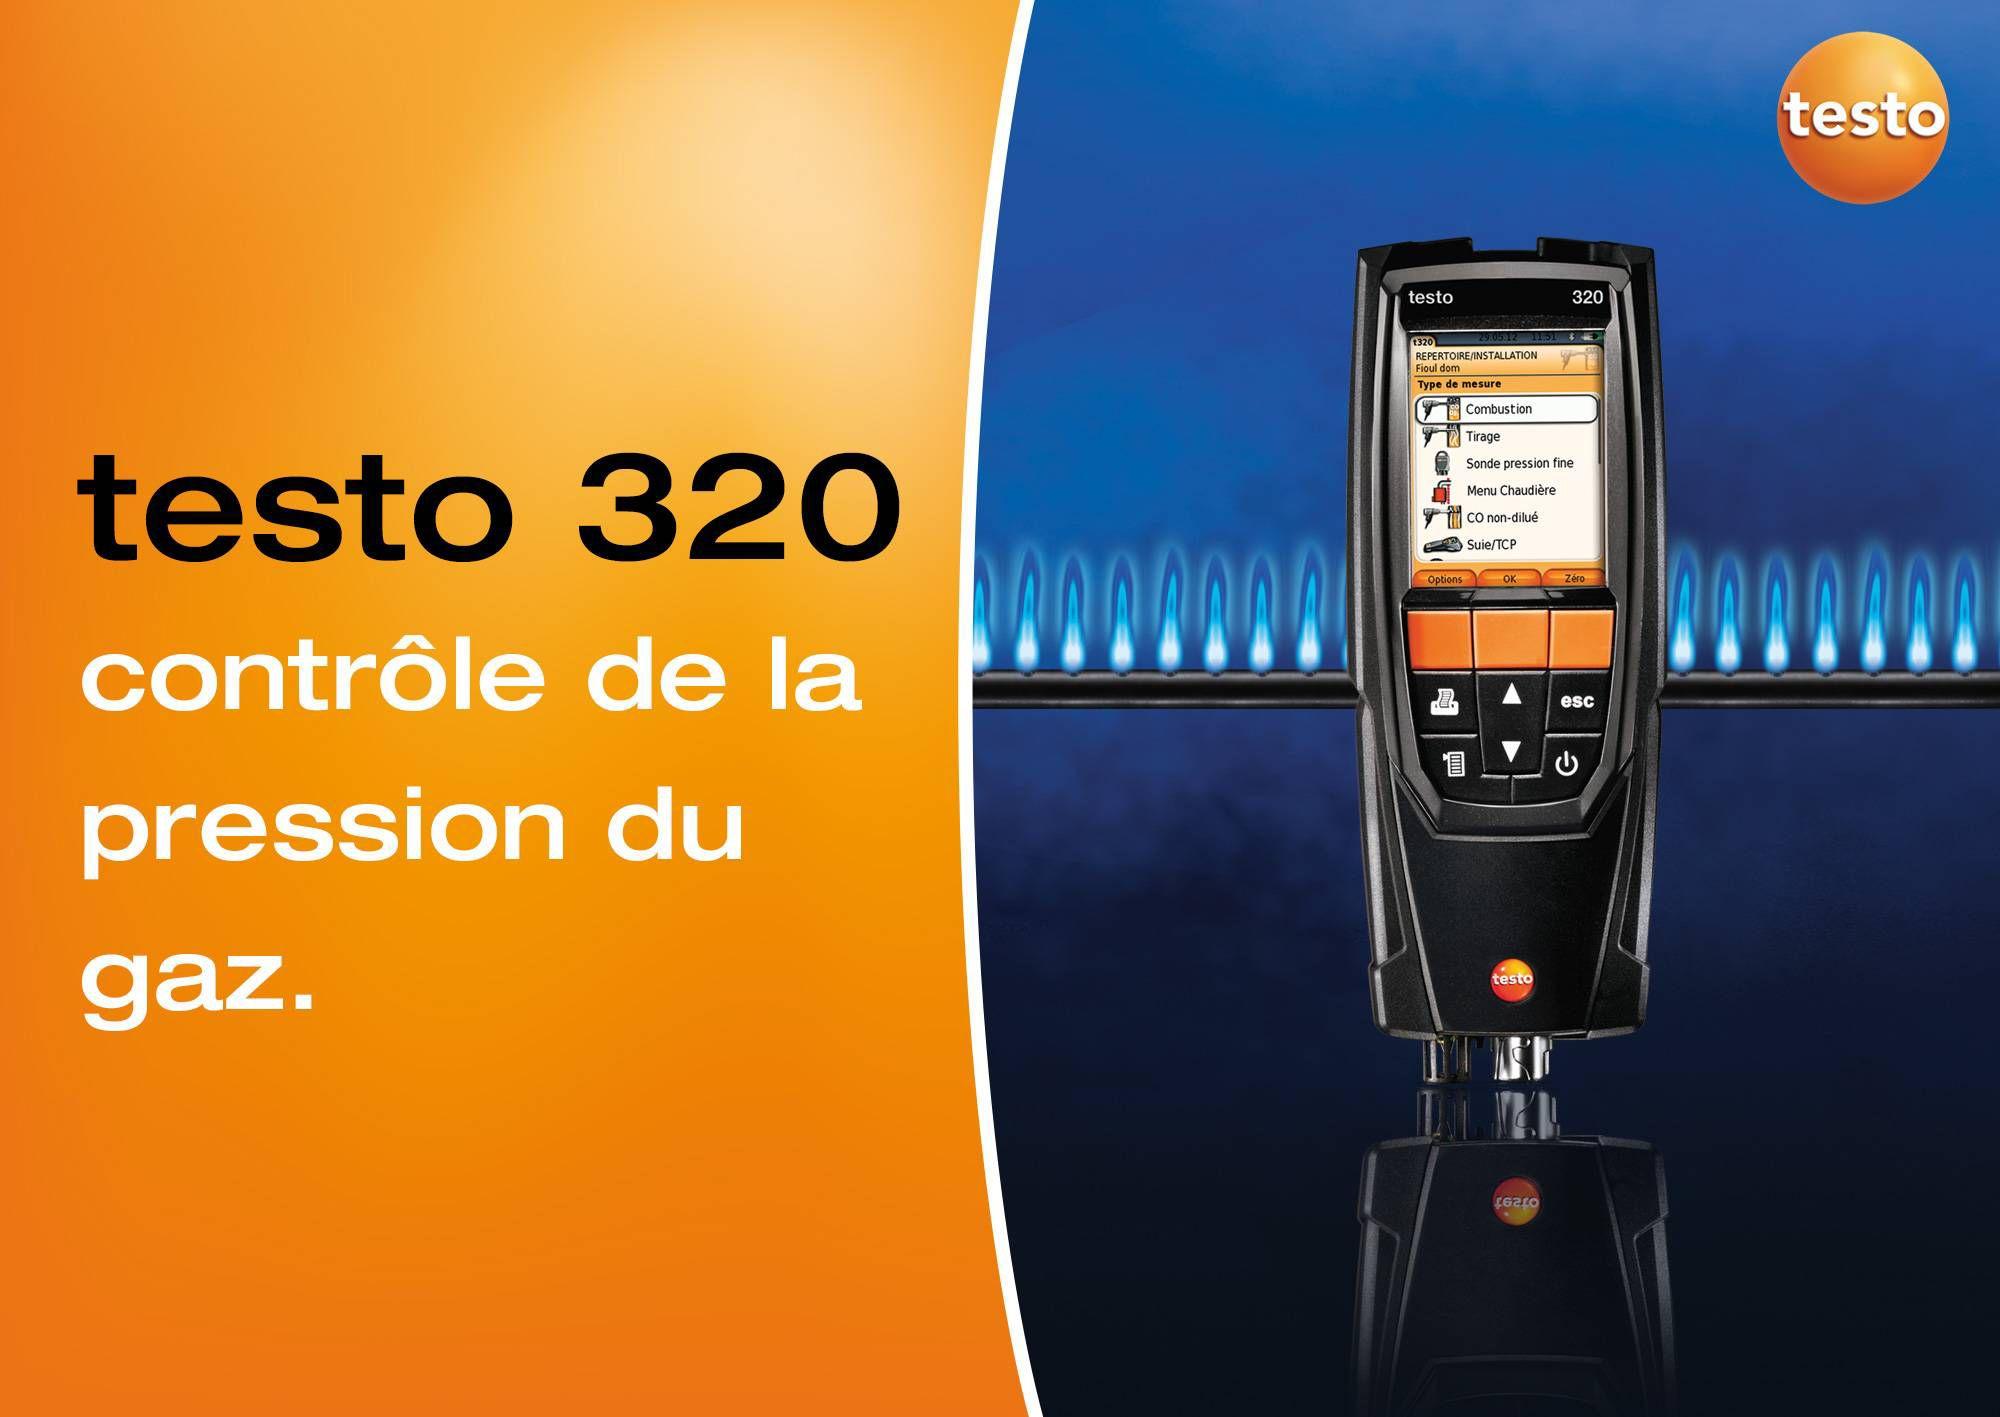 tutoriel vidéo contrôle pression gaz testo 320